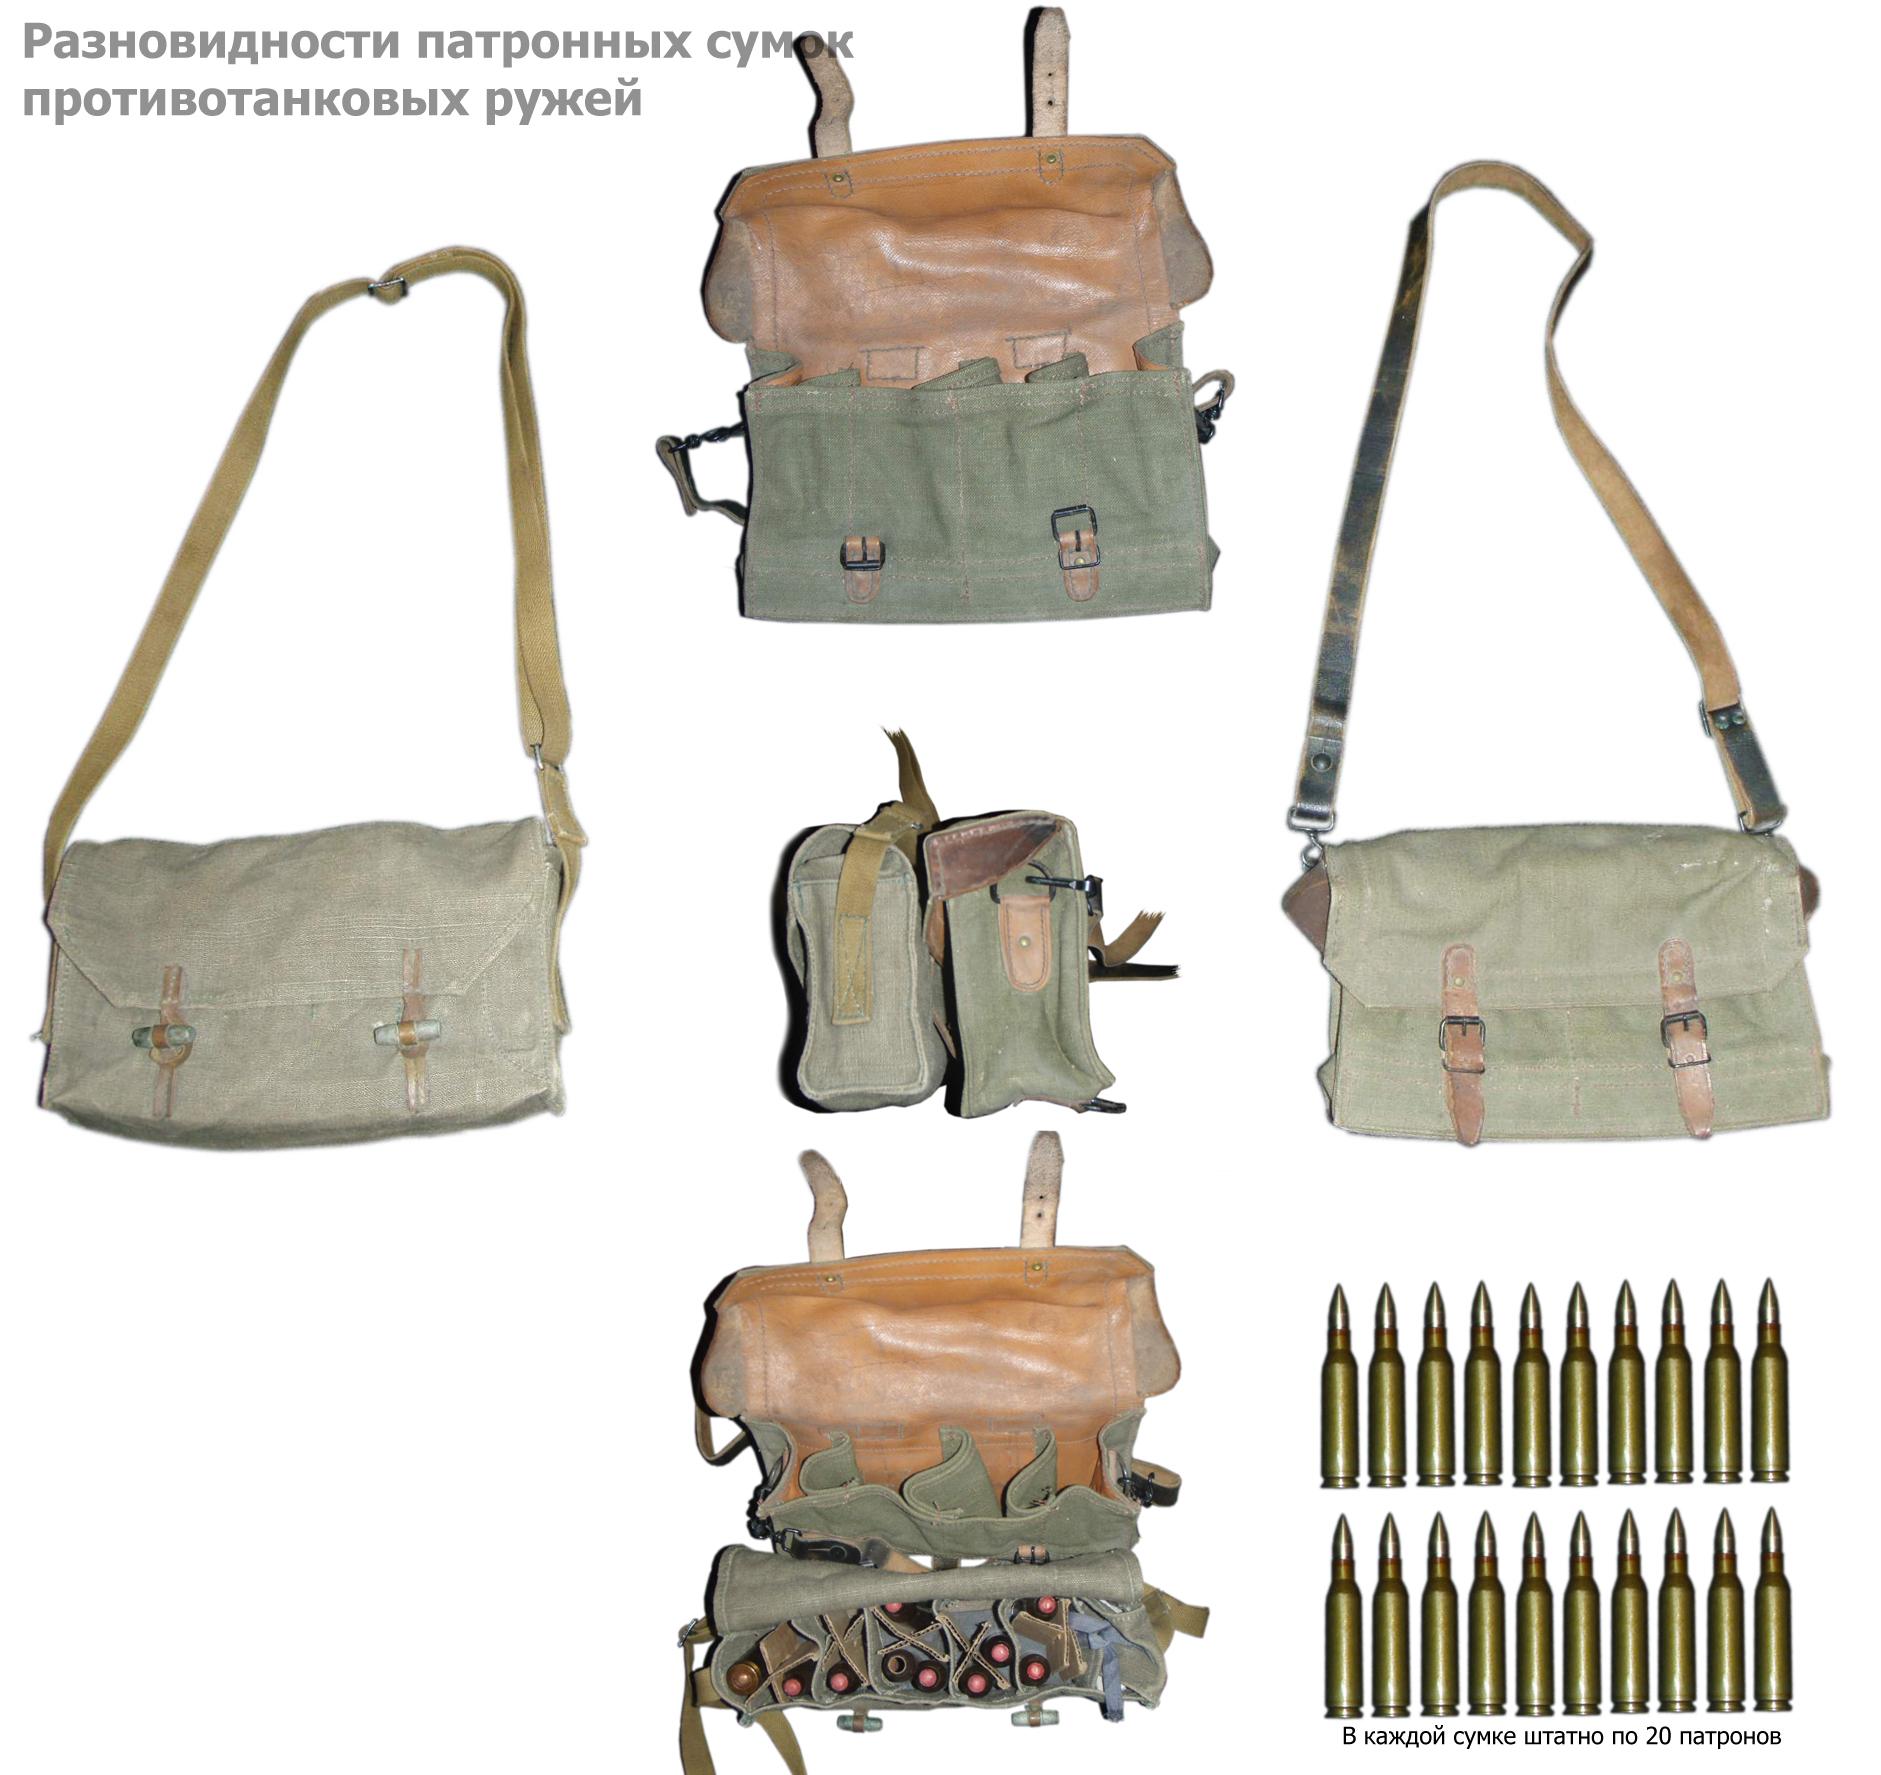 Два варианта патронной сумки для 14,5-мм патрон